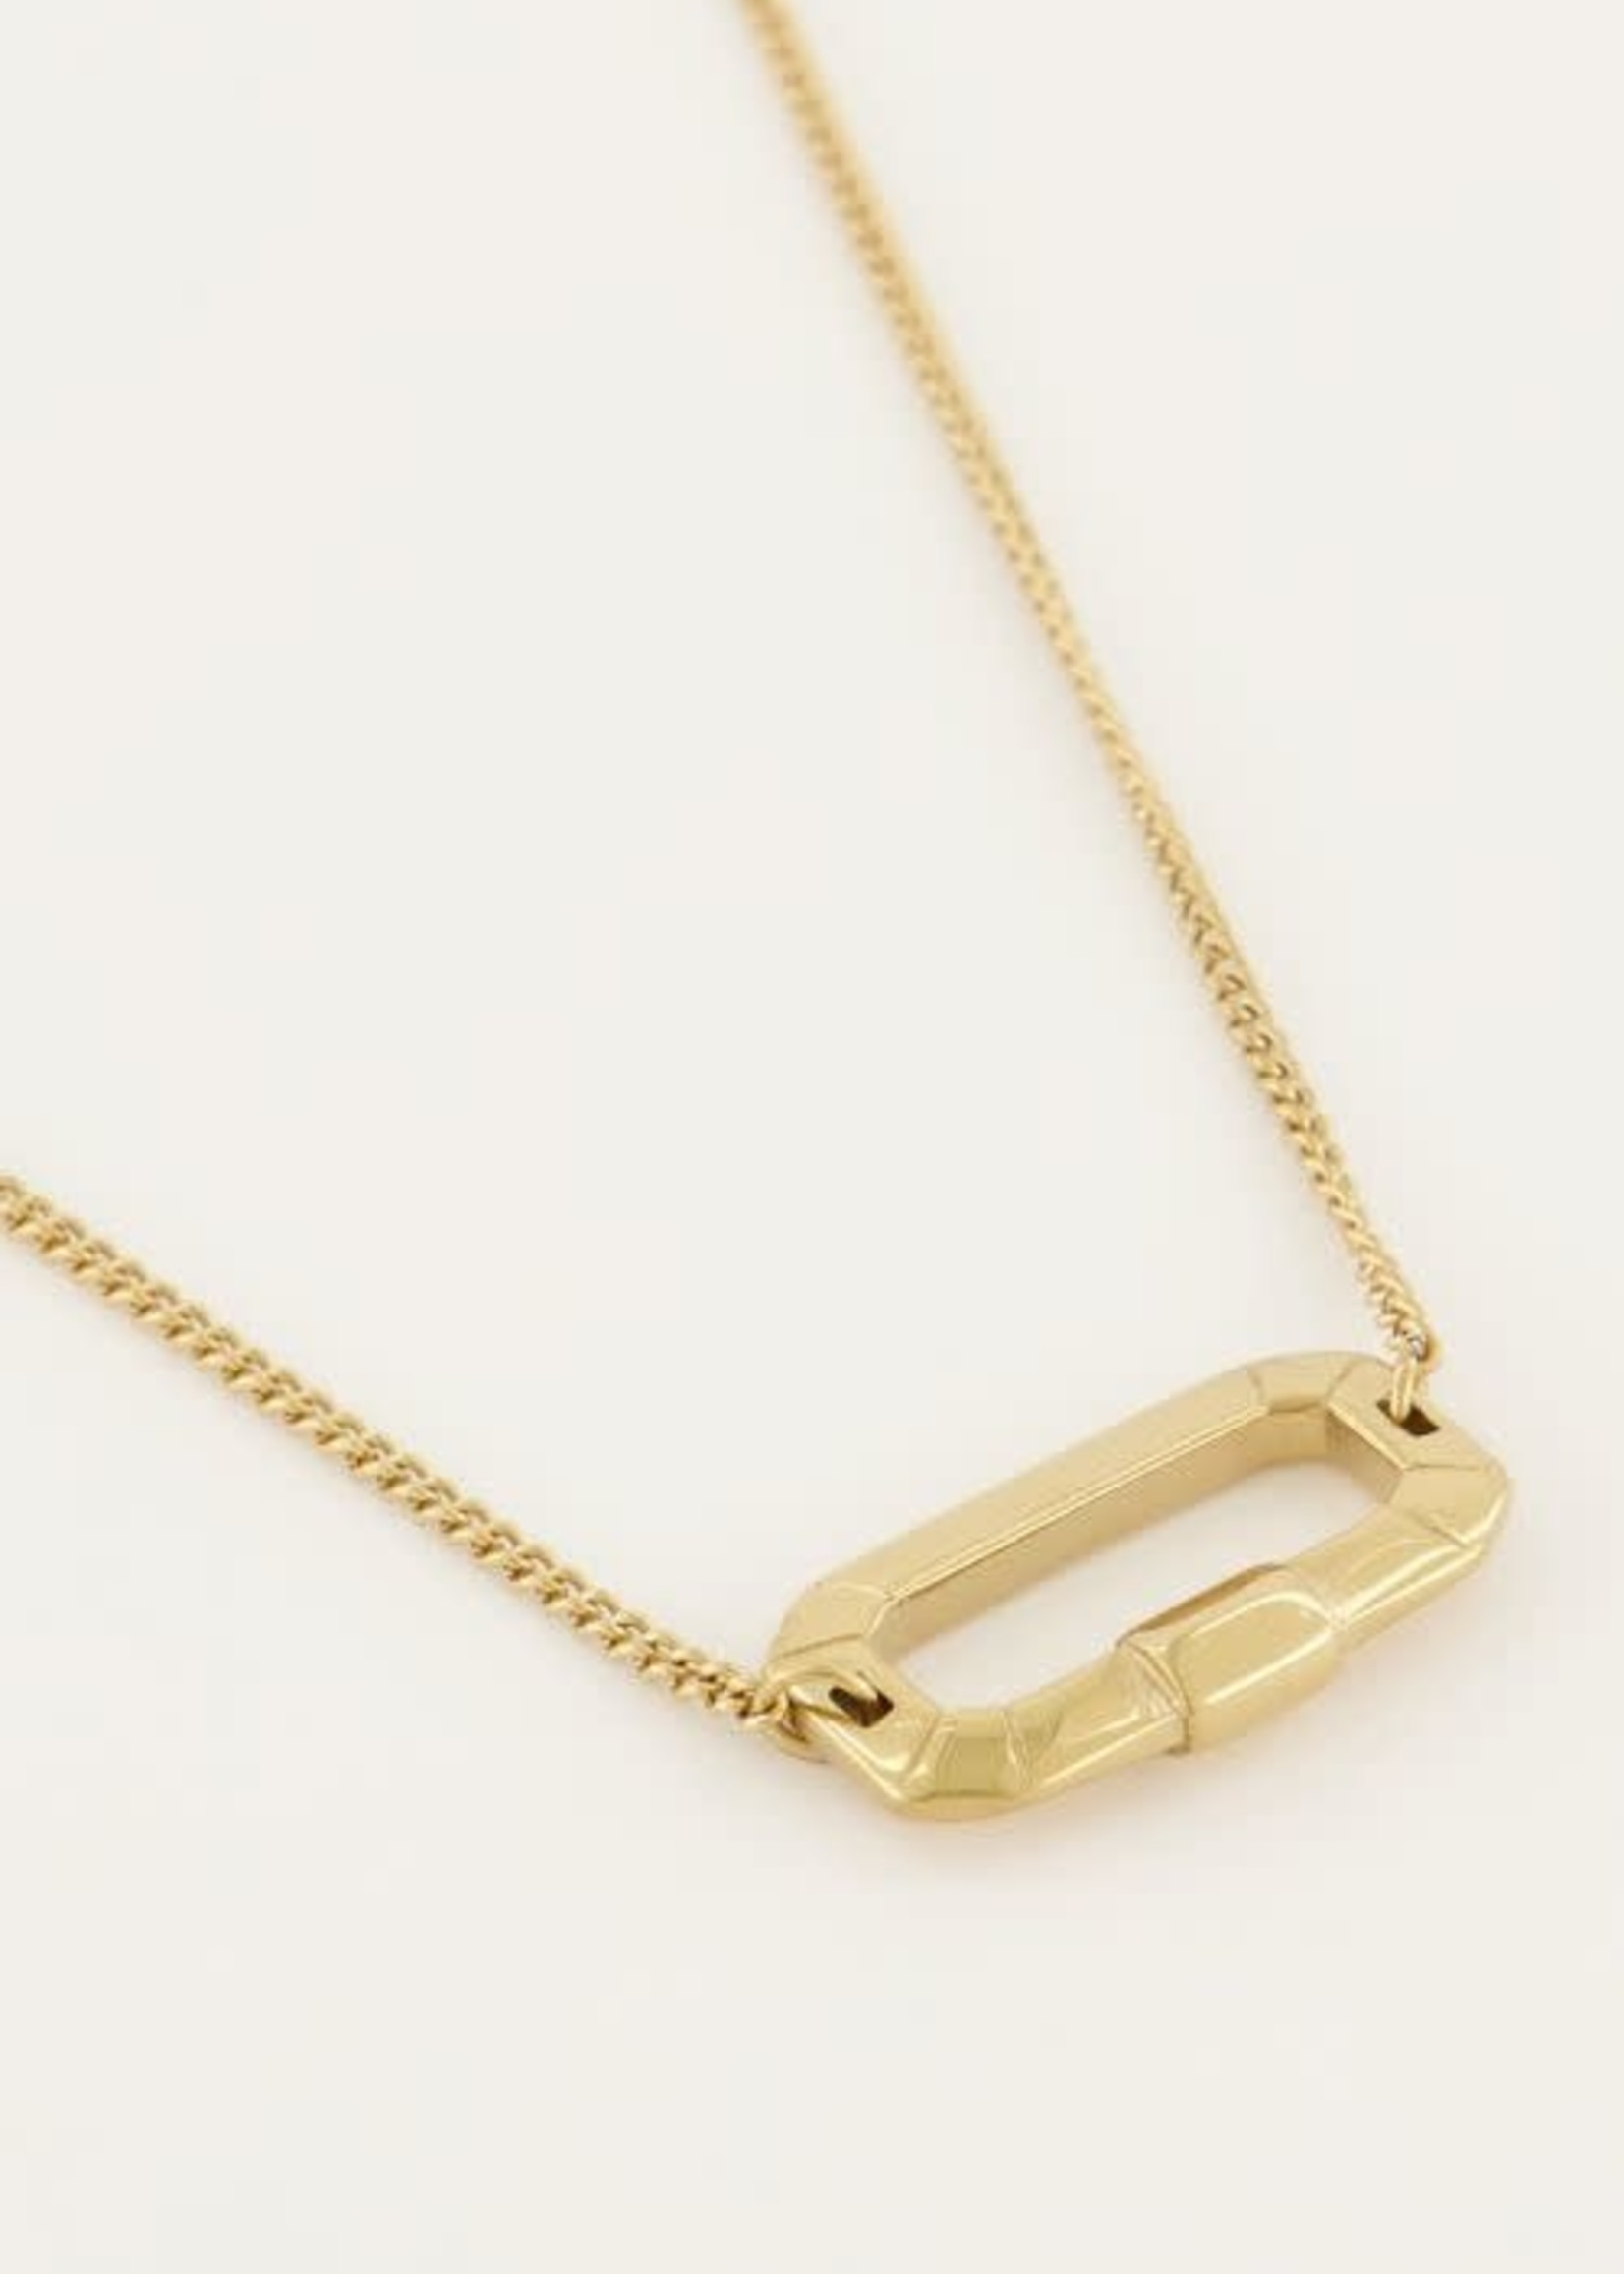 My Jewellery My Jewellery Shapes ketting met rechthoek